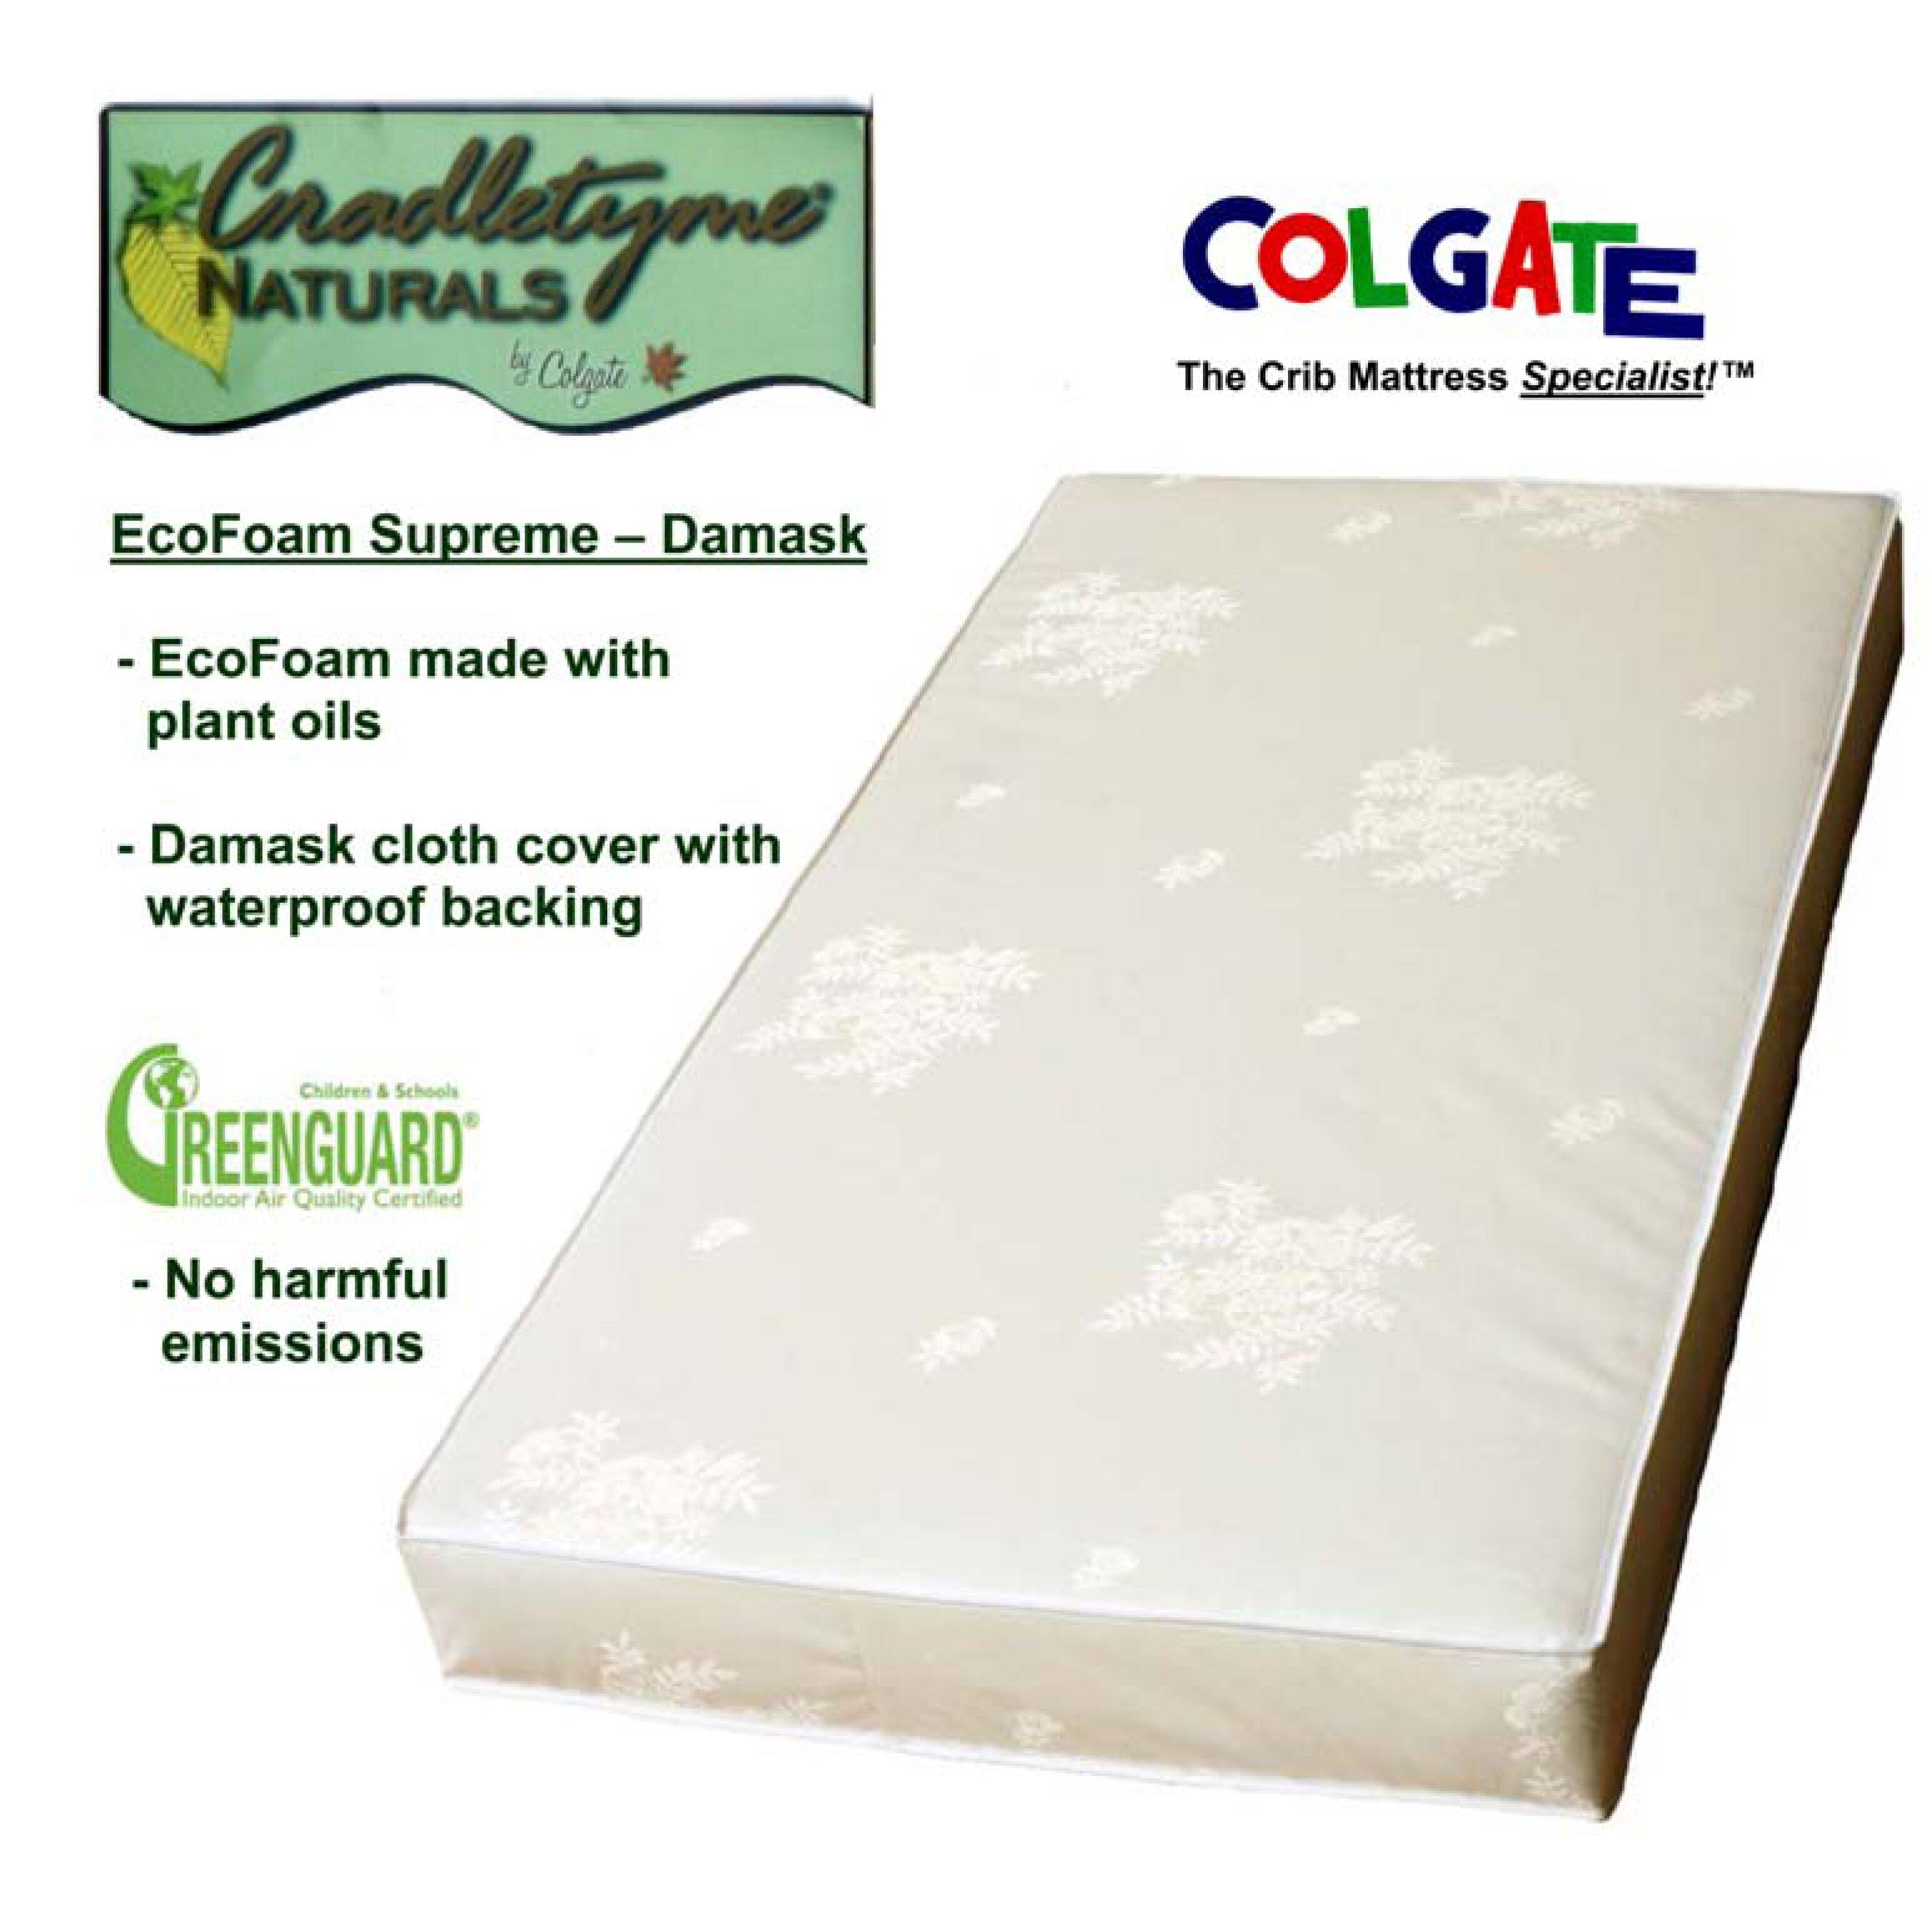 Colgate Cradletyme Naturals Ecofoam Supreme Damask Cloth